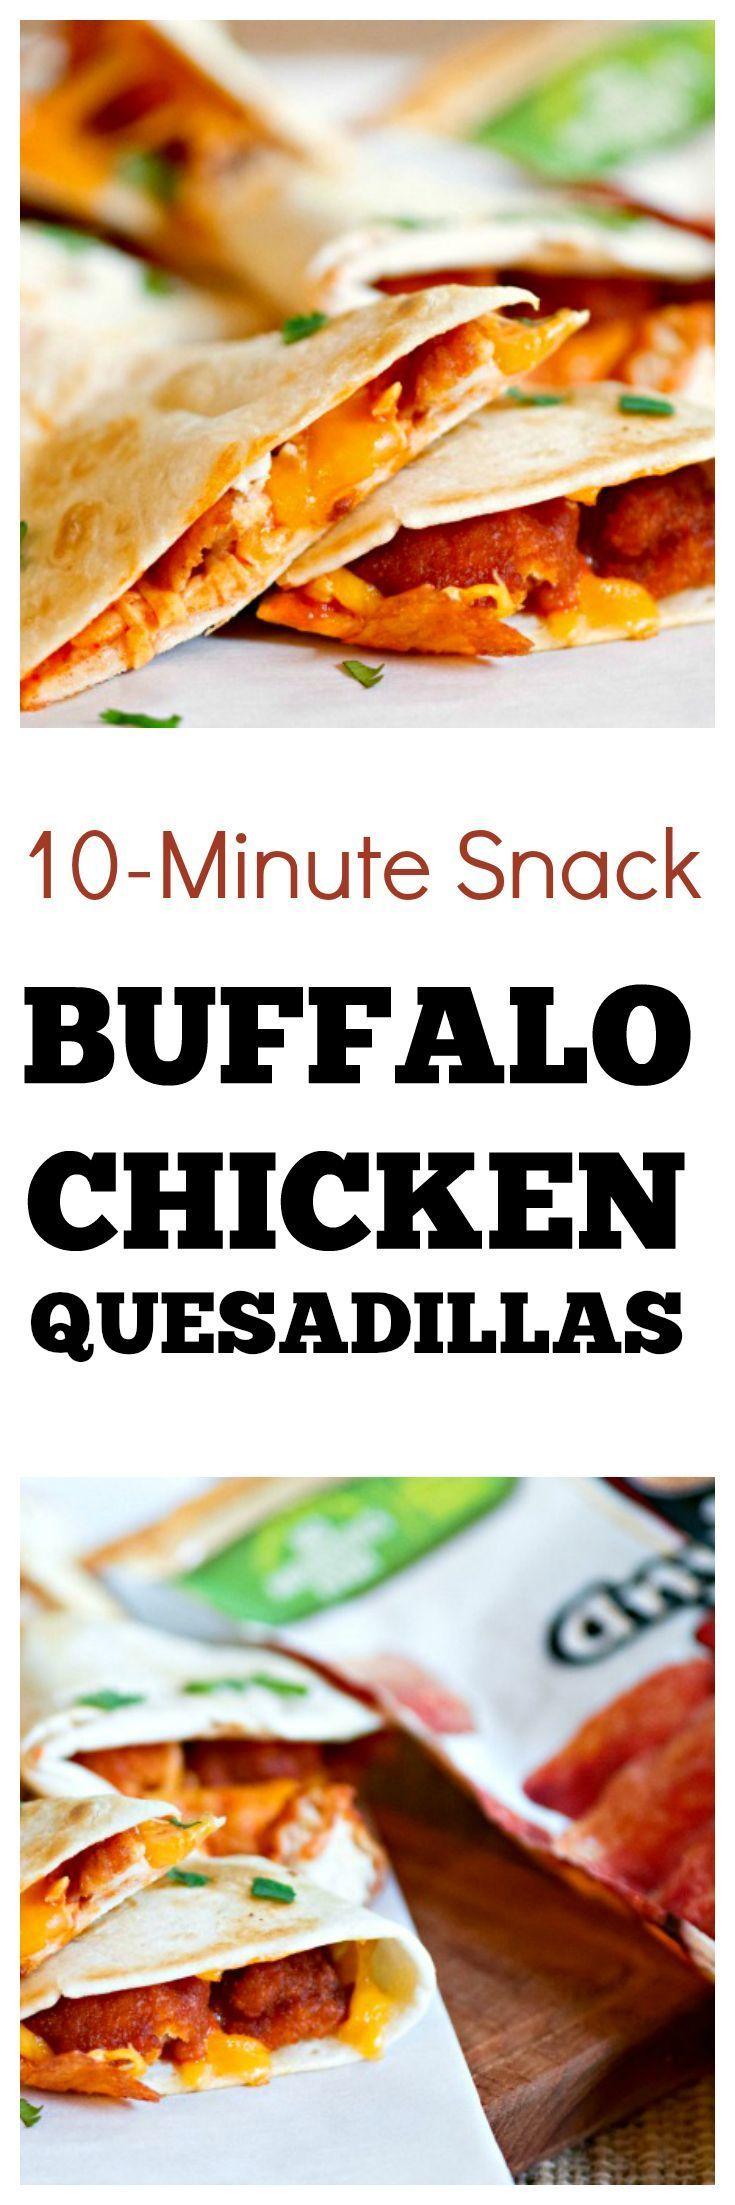 Buffalo Chicken Quesadilla Recipe   Easy snack recipe #ad #snackideas #cheesy